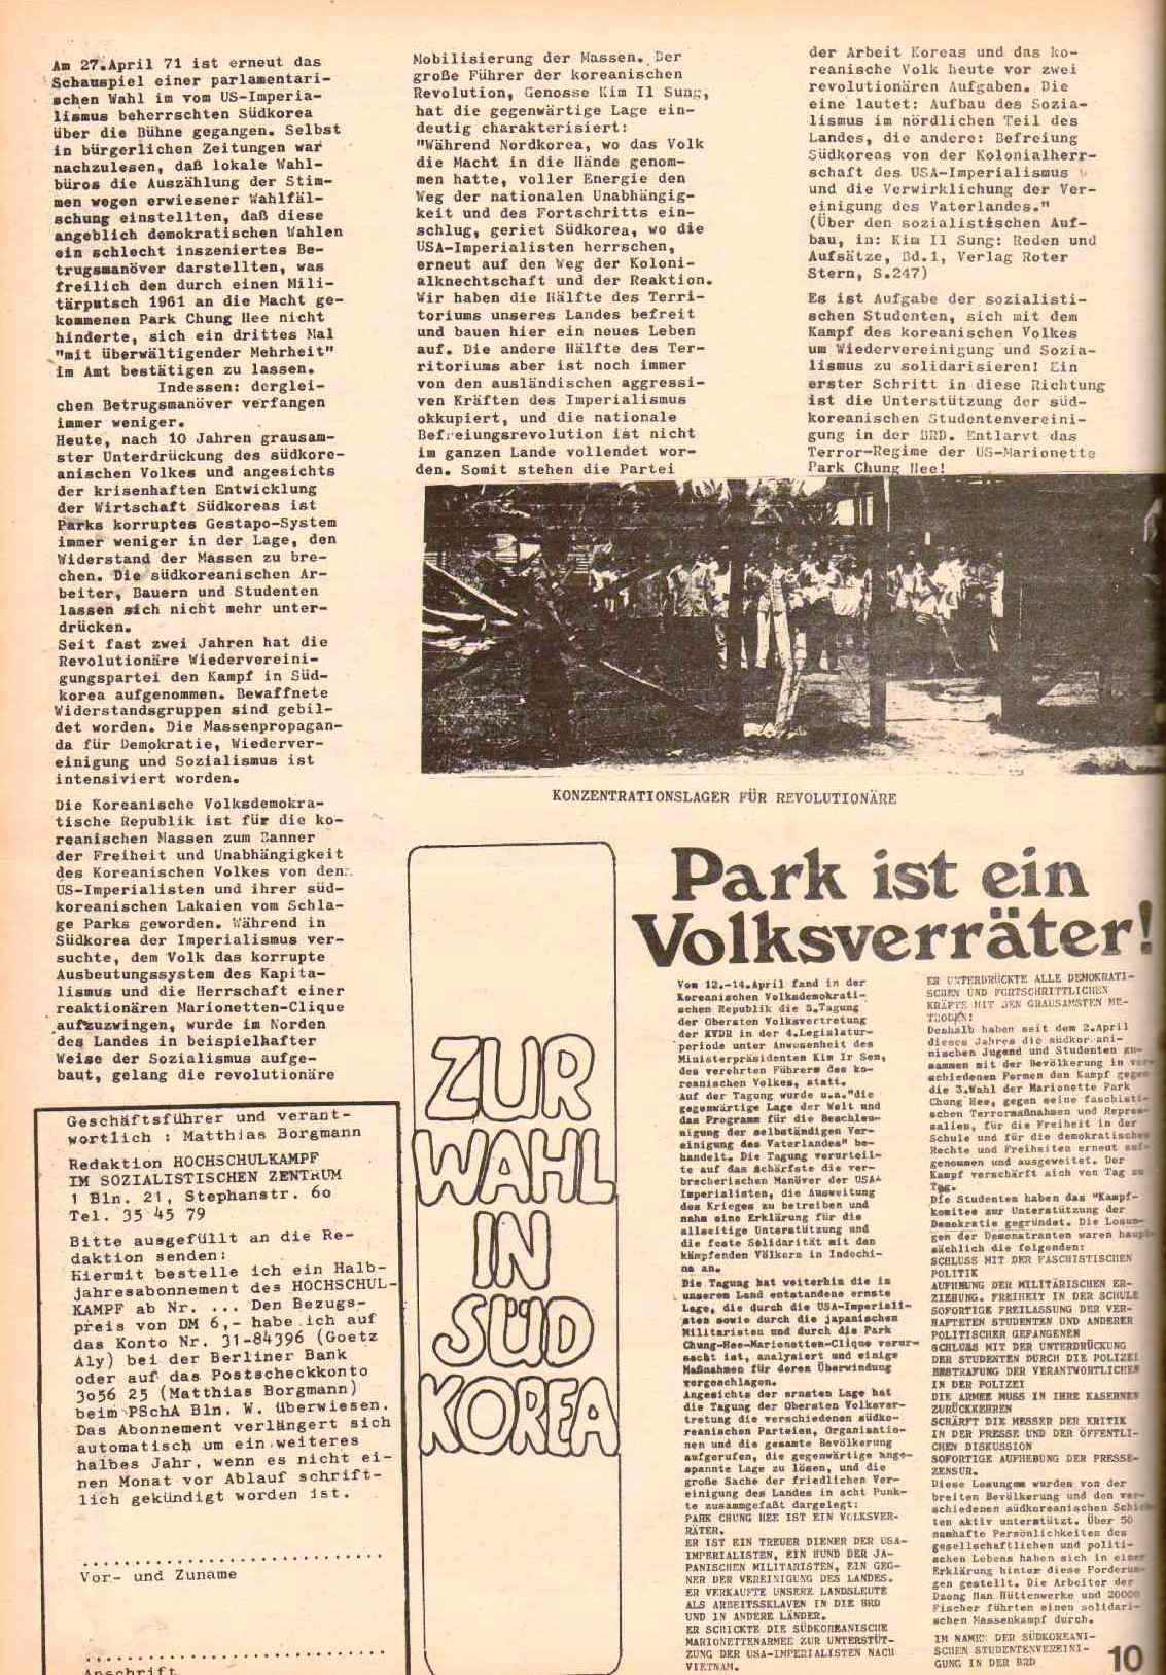 Berlin_Hochschulkampf_1971_08_12